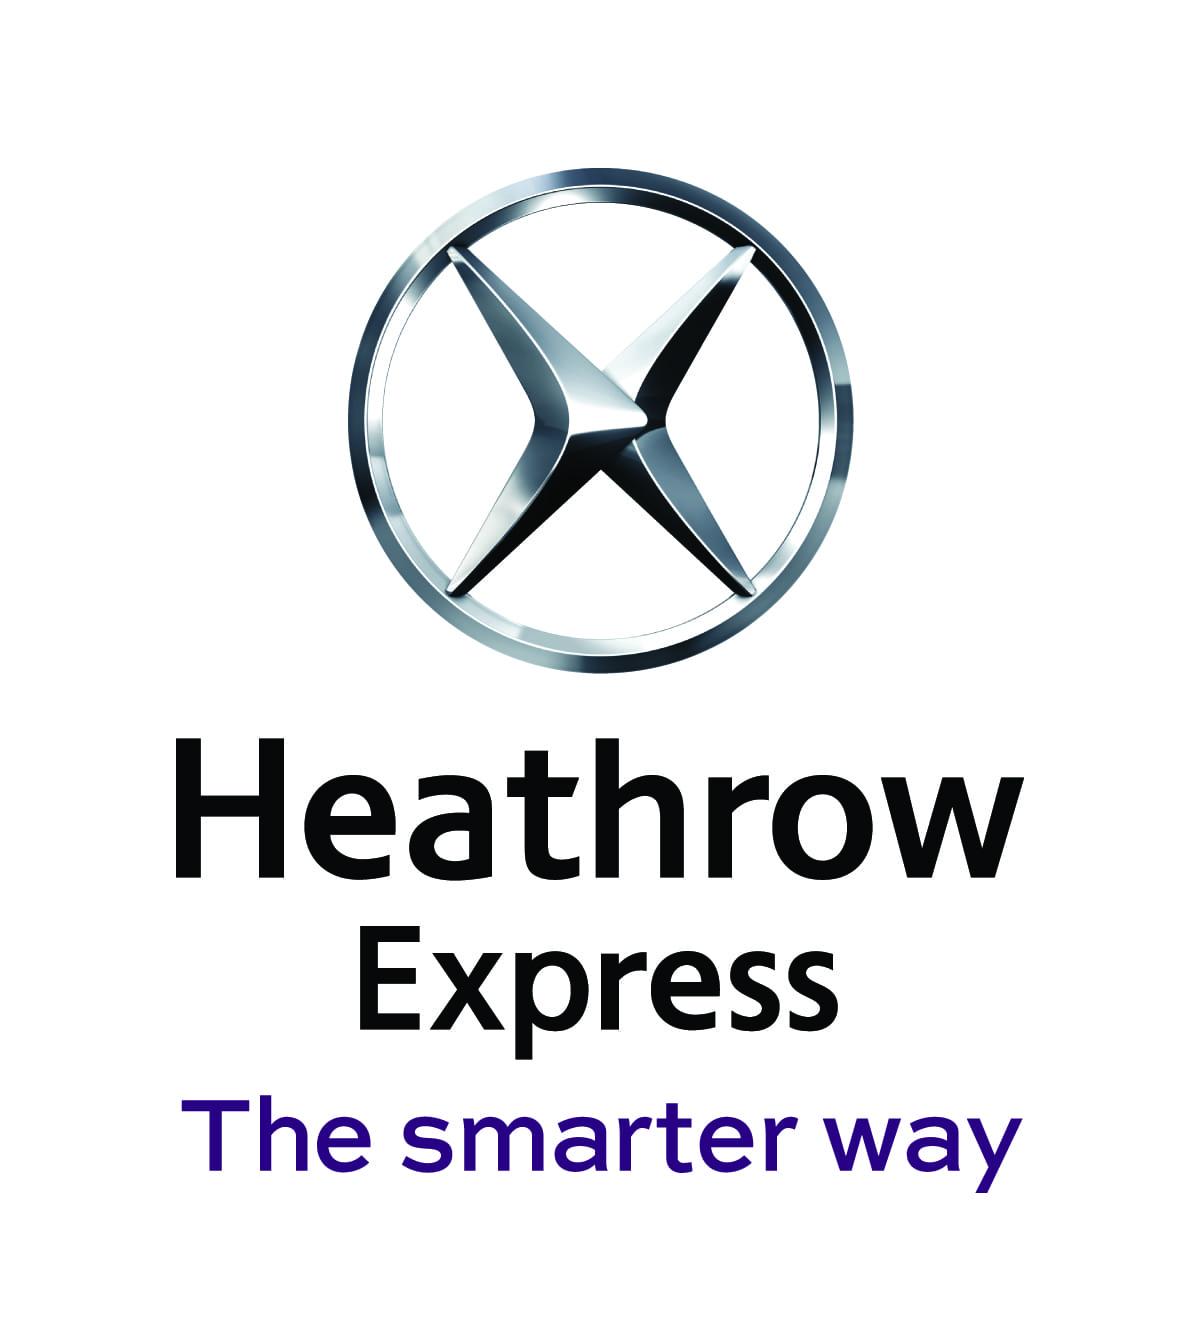 Promotion code heathrow express / San francisco cartwright hotel